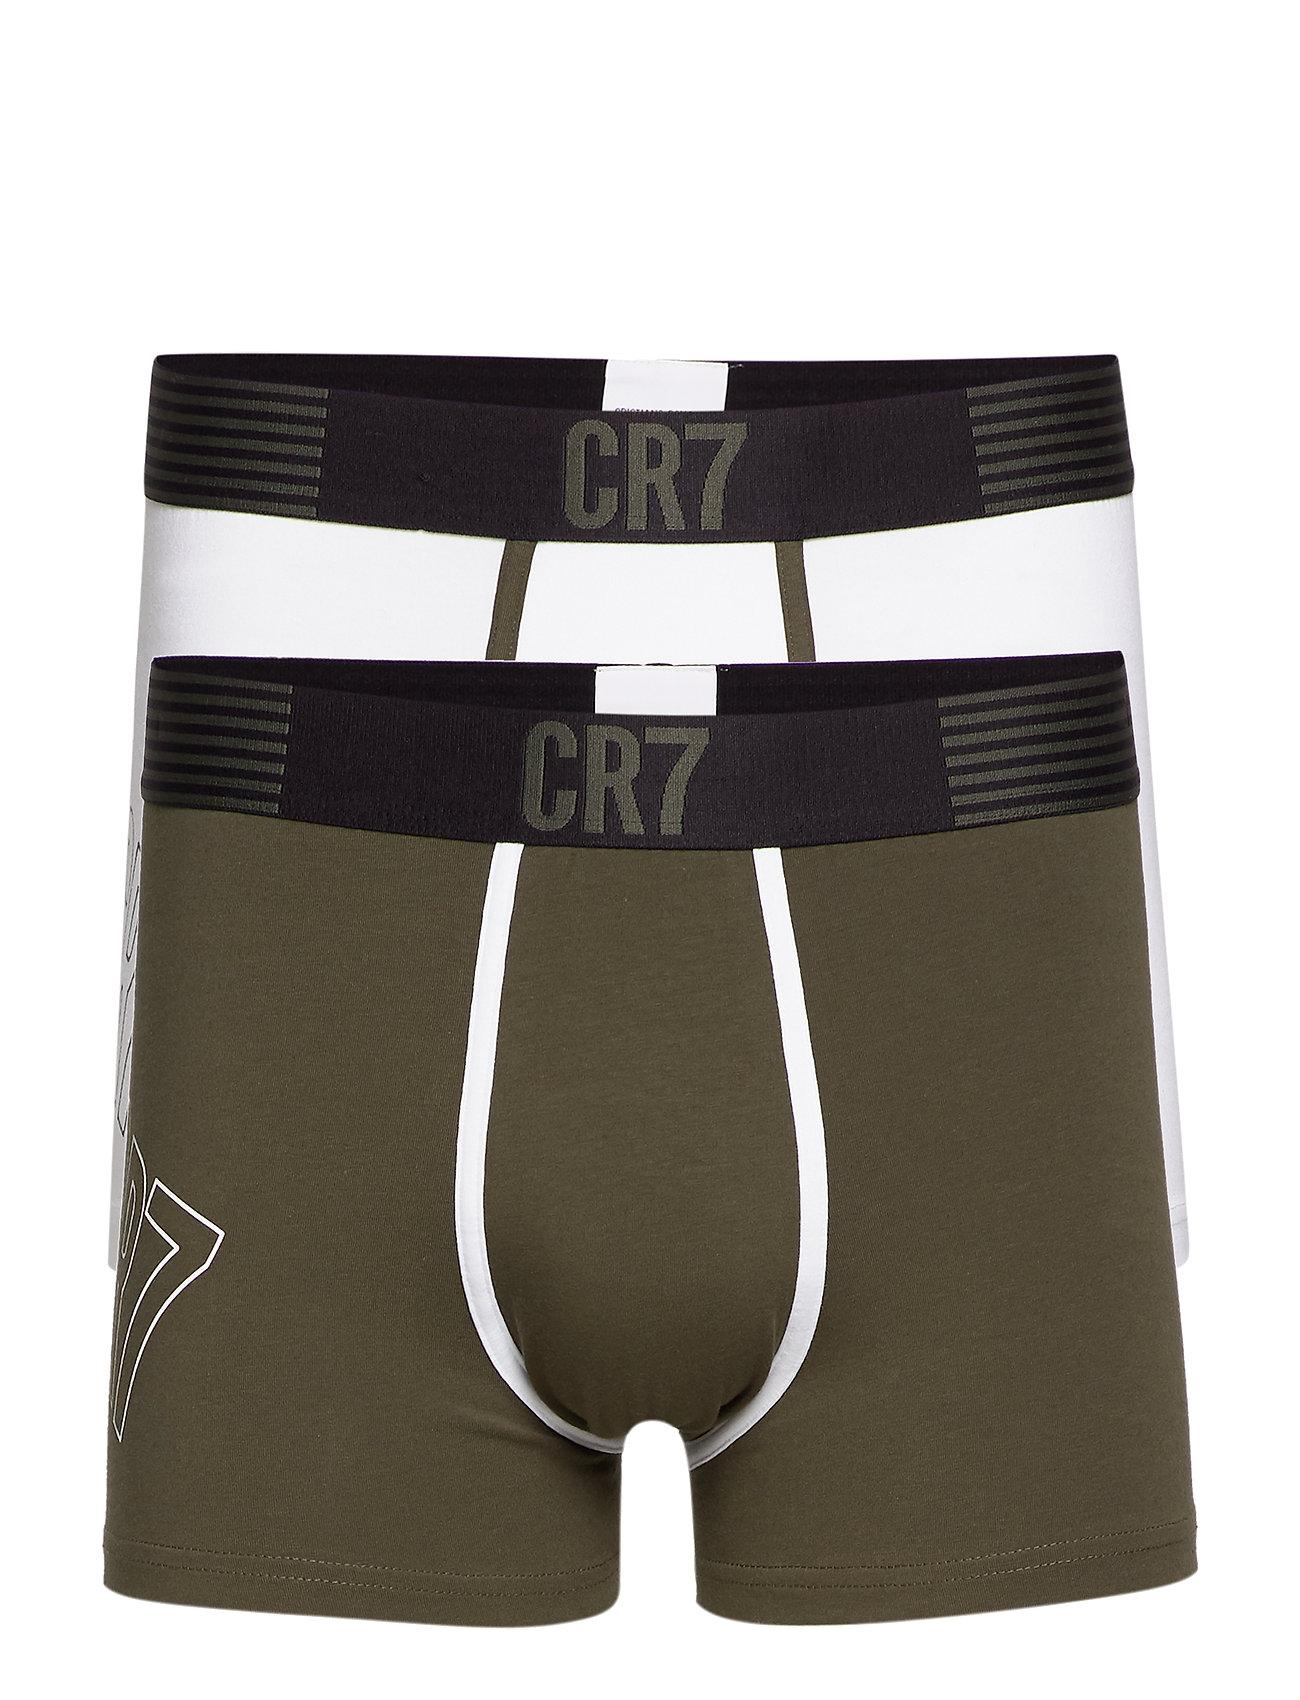 CR7 CR7 Fashion, Trunk 2-pack - MULTI